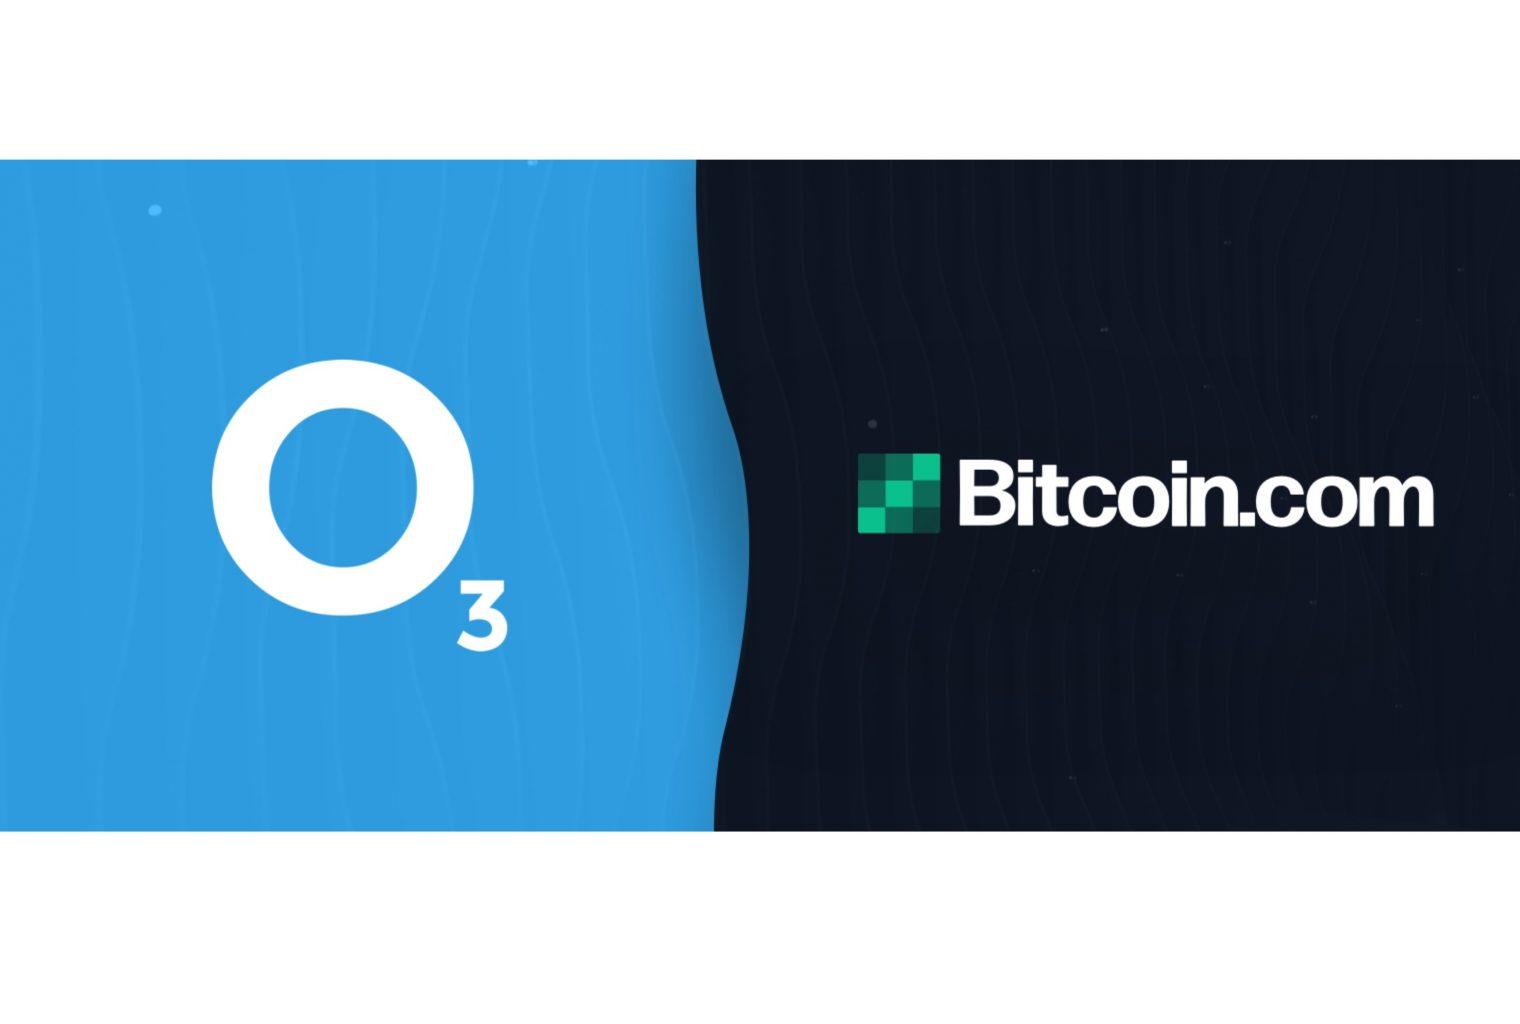 Bitcoin.com Acquires Blockchain Software Startup O3 Labs